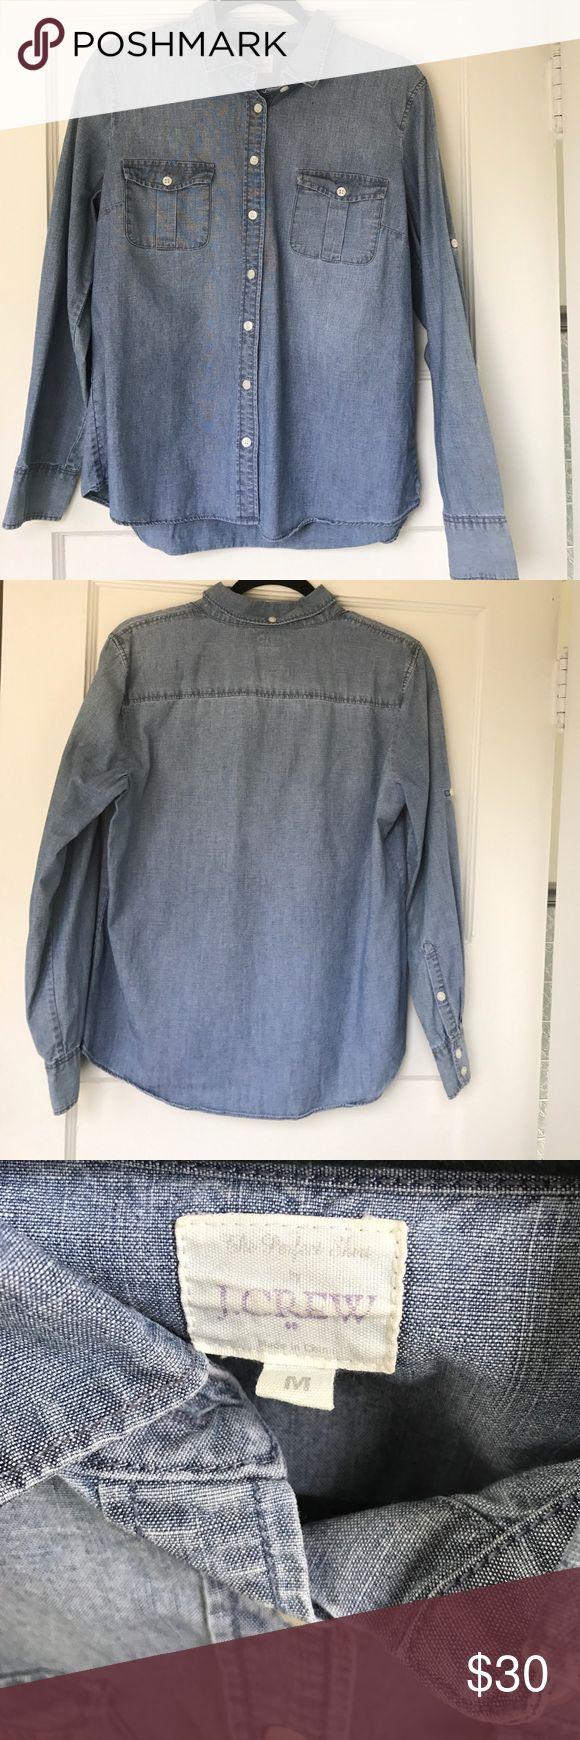 J. Crew Chambray Shirt Classic chambray shirt! Like brand new. Never worn! J. Crew Tops Button Down Shirts